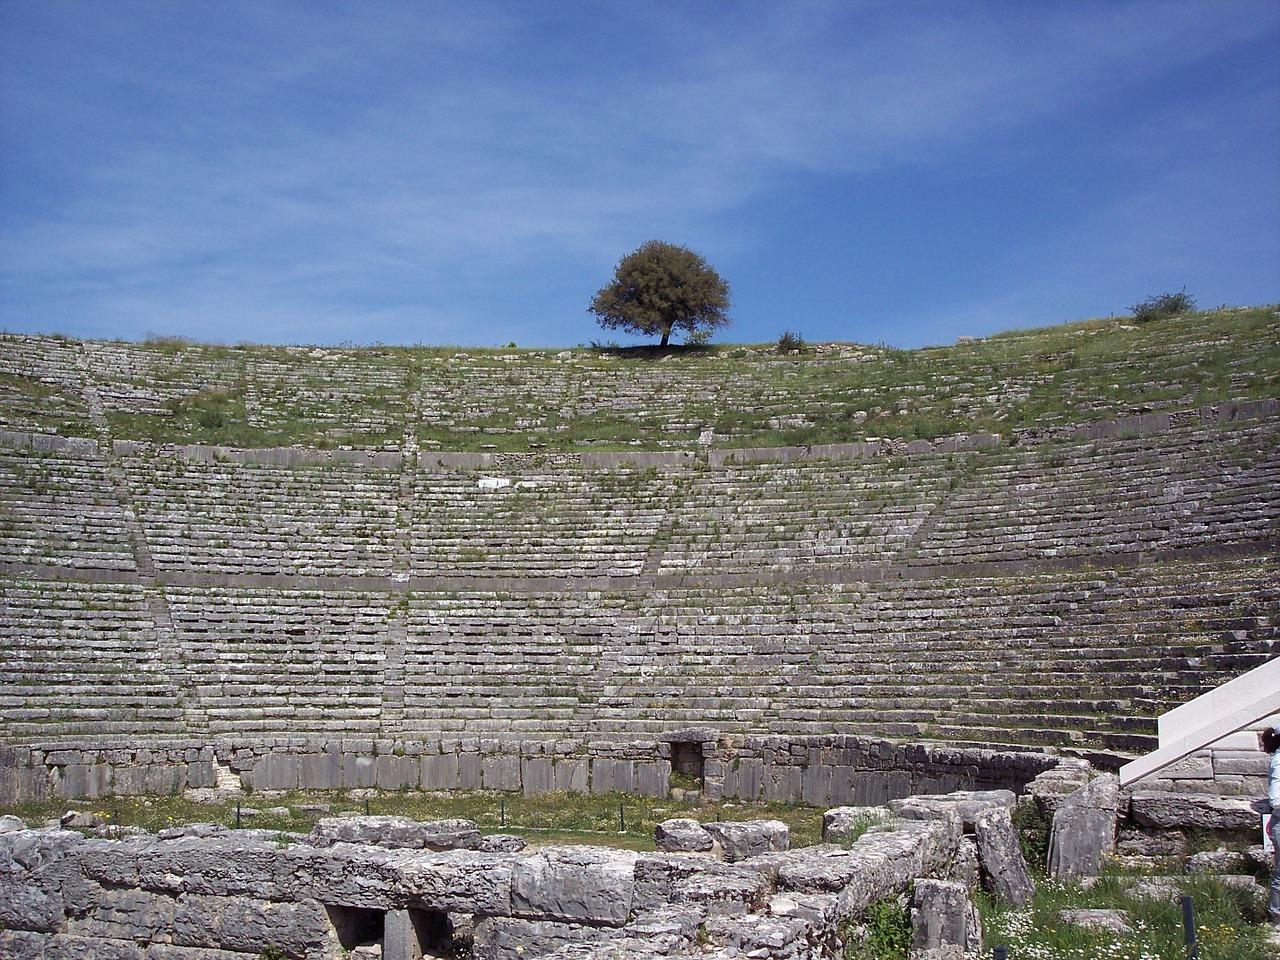 Dodoni Archaeological Site in Epirus, Greece